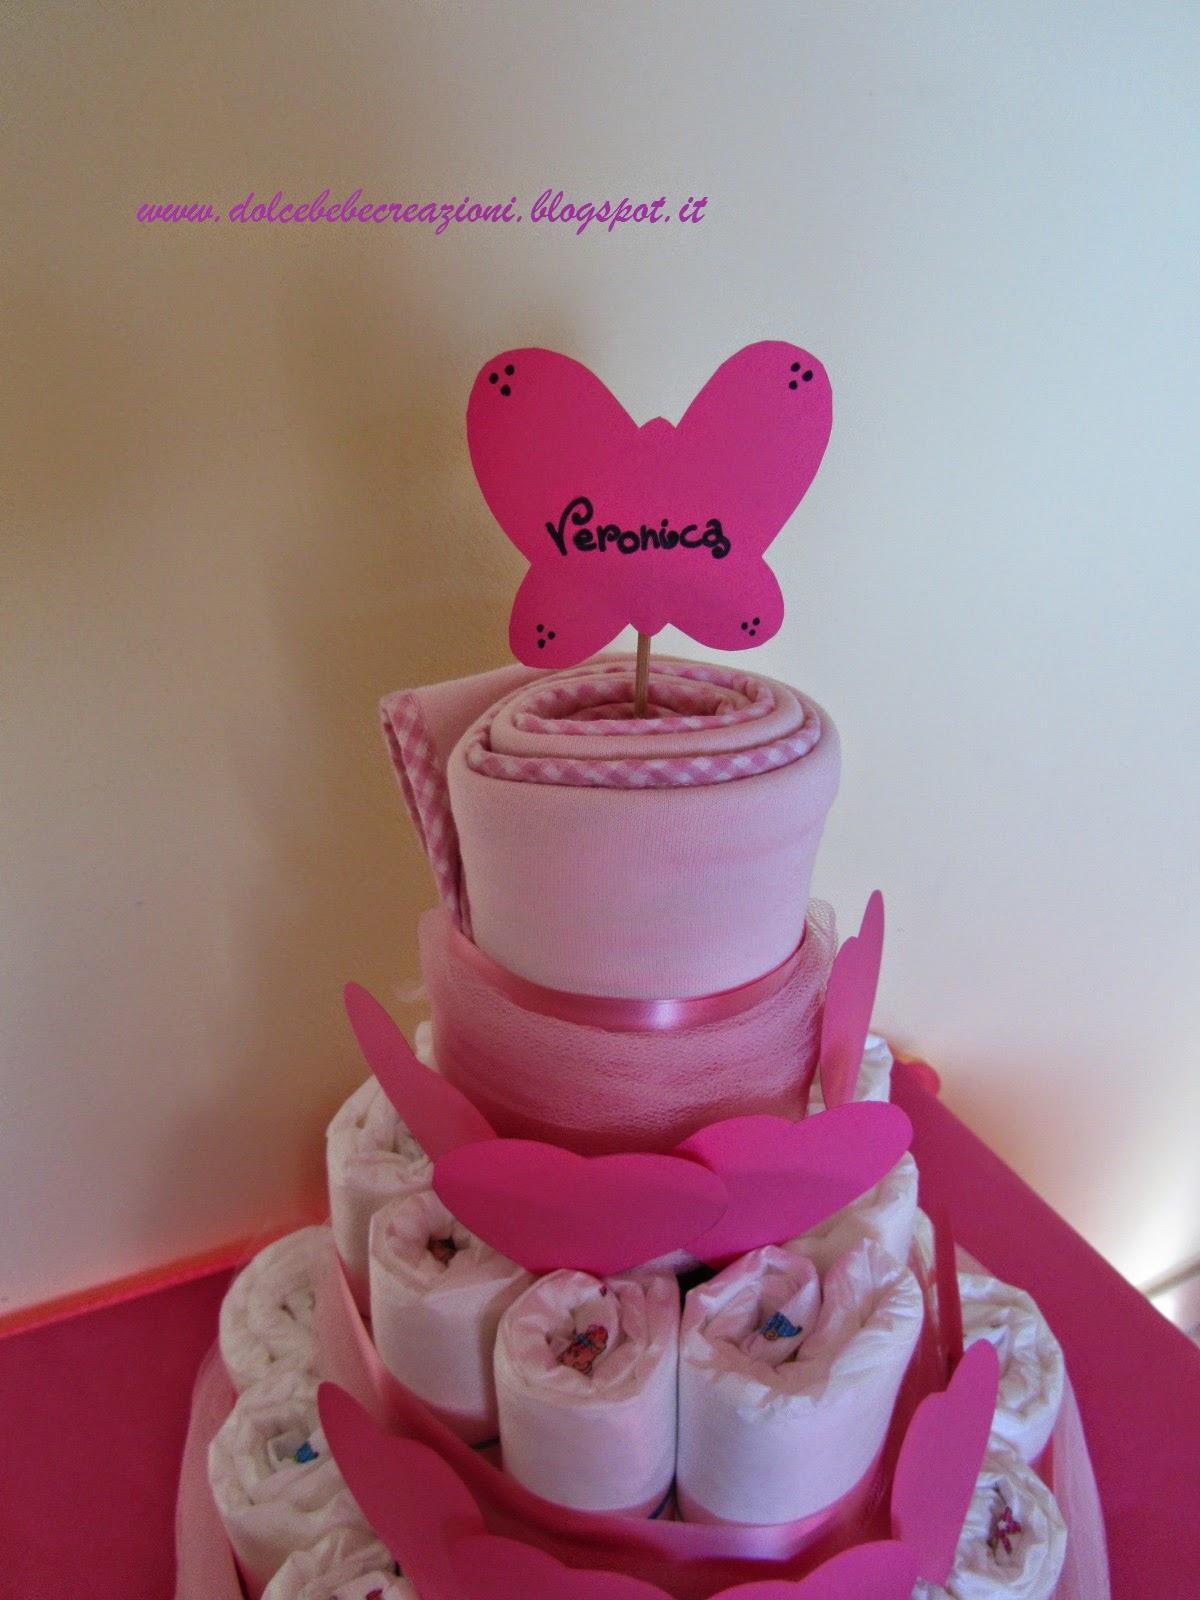 Super Una torta di pannolini con i cuori | Dolce Bebè creazioni AL28